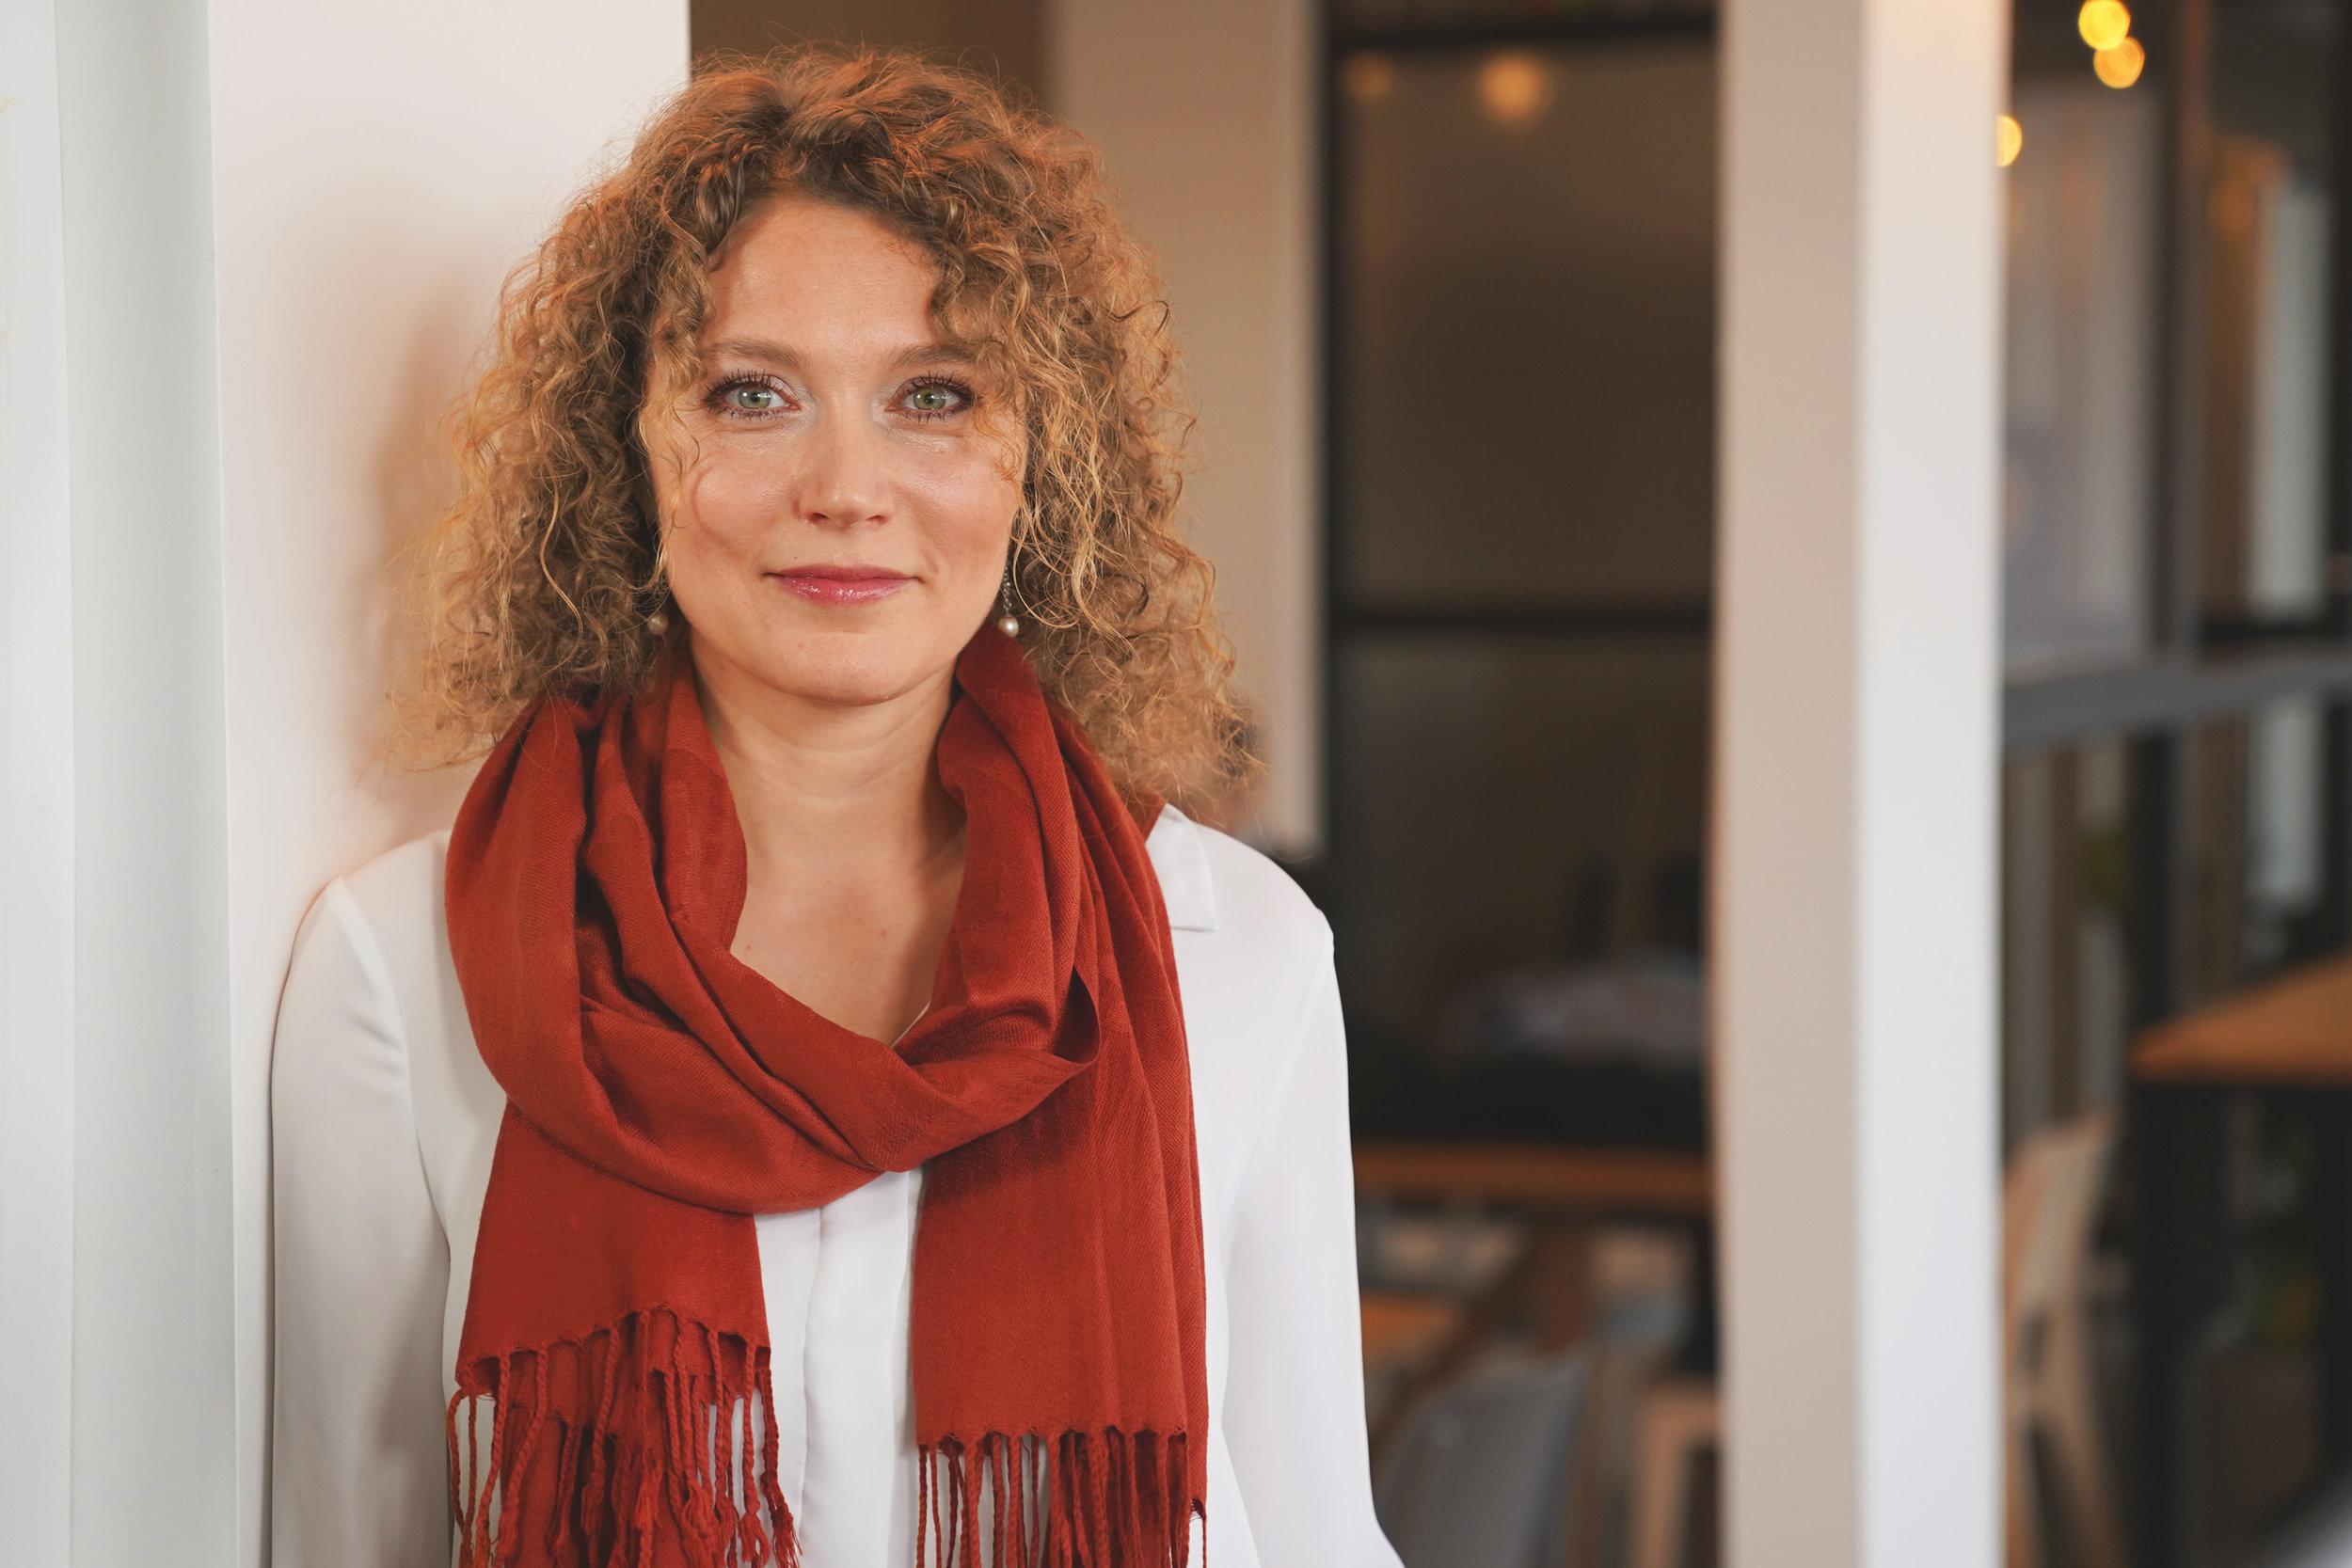 Irene Oksinoglu